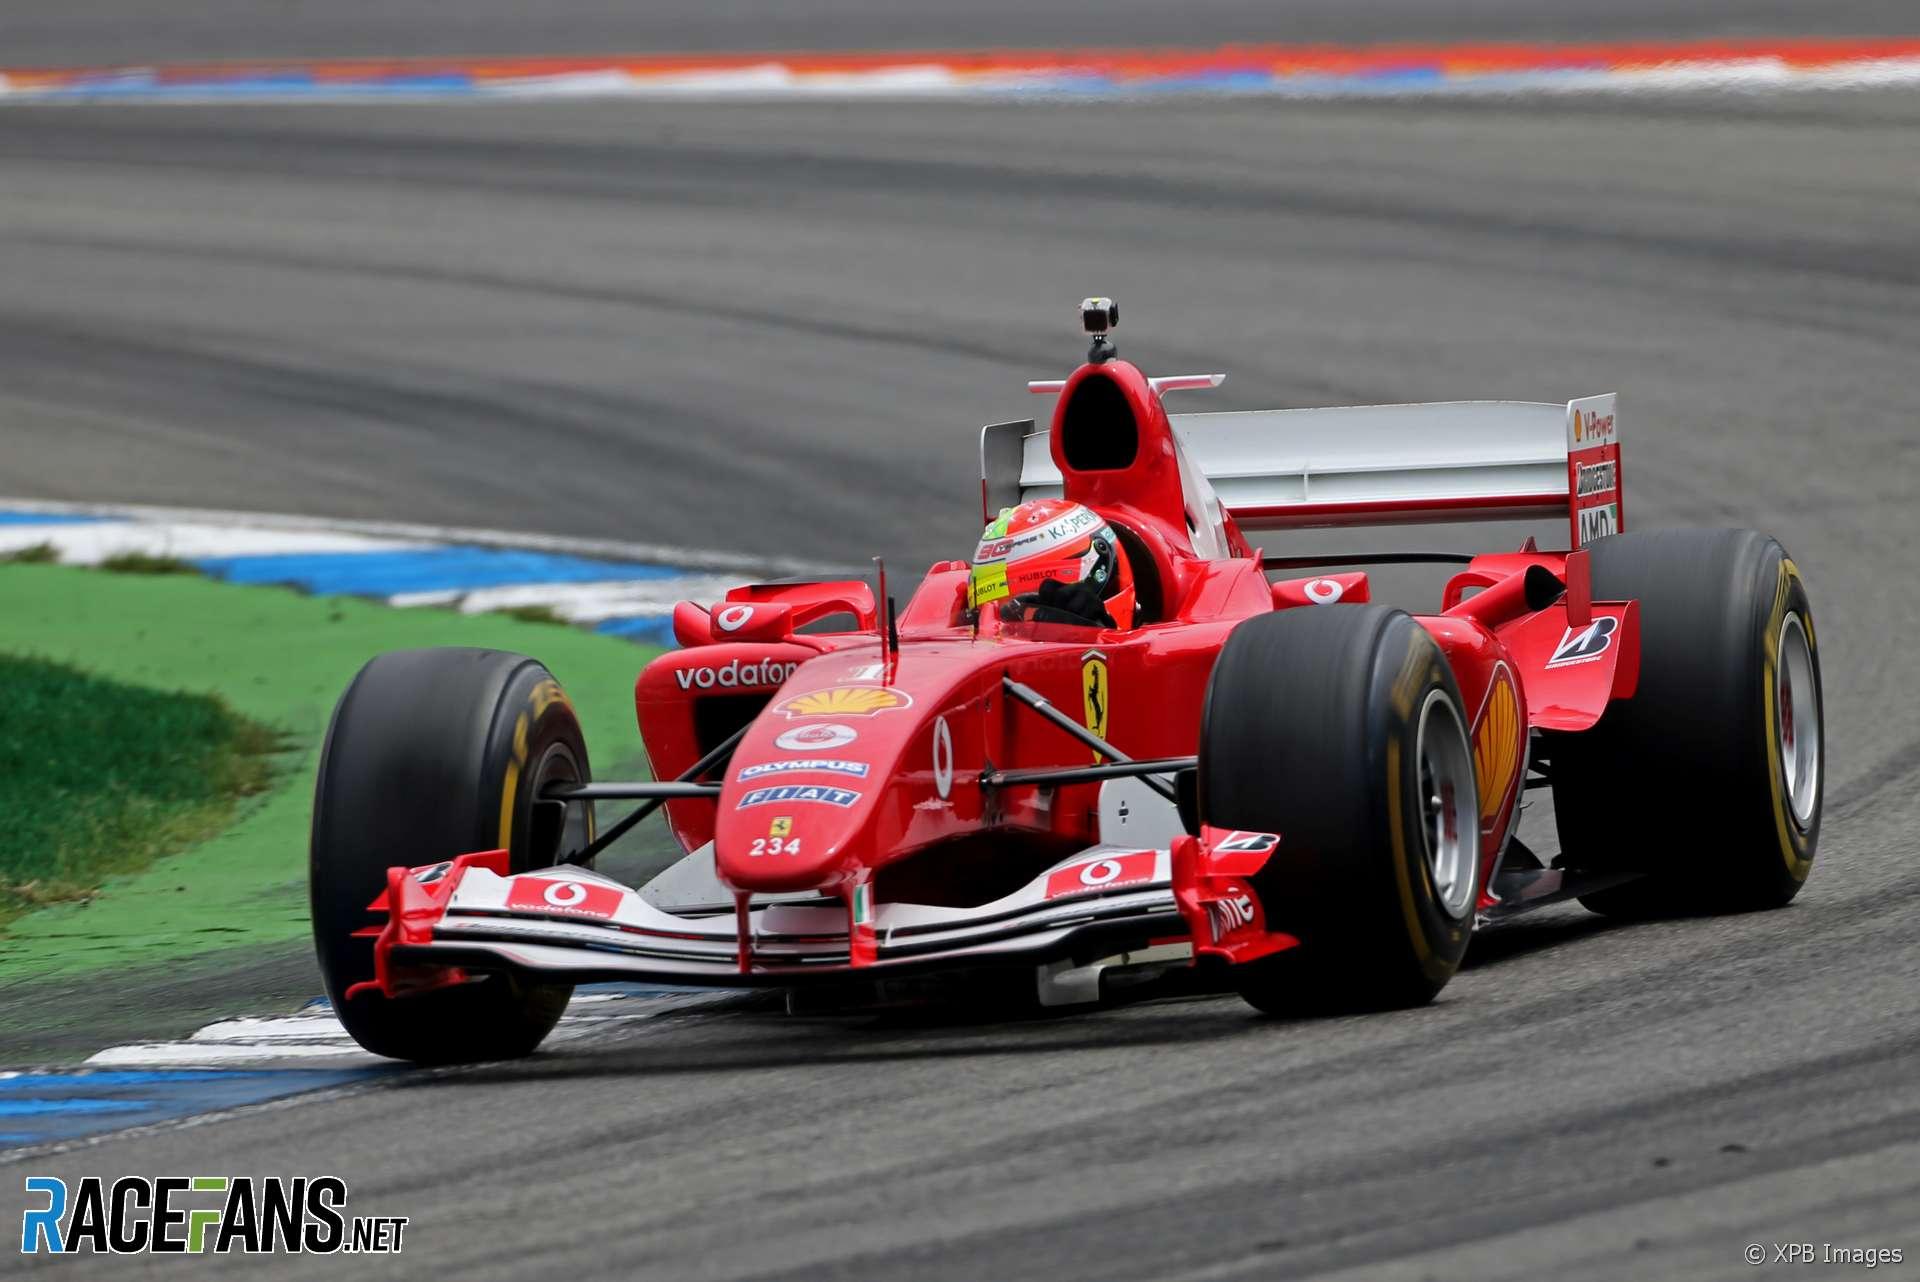 Mick Schumacher, Ferrari F2004, Hockenheimring, 2019